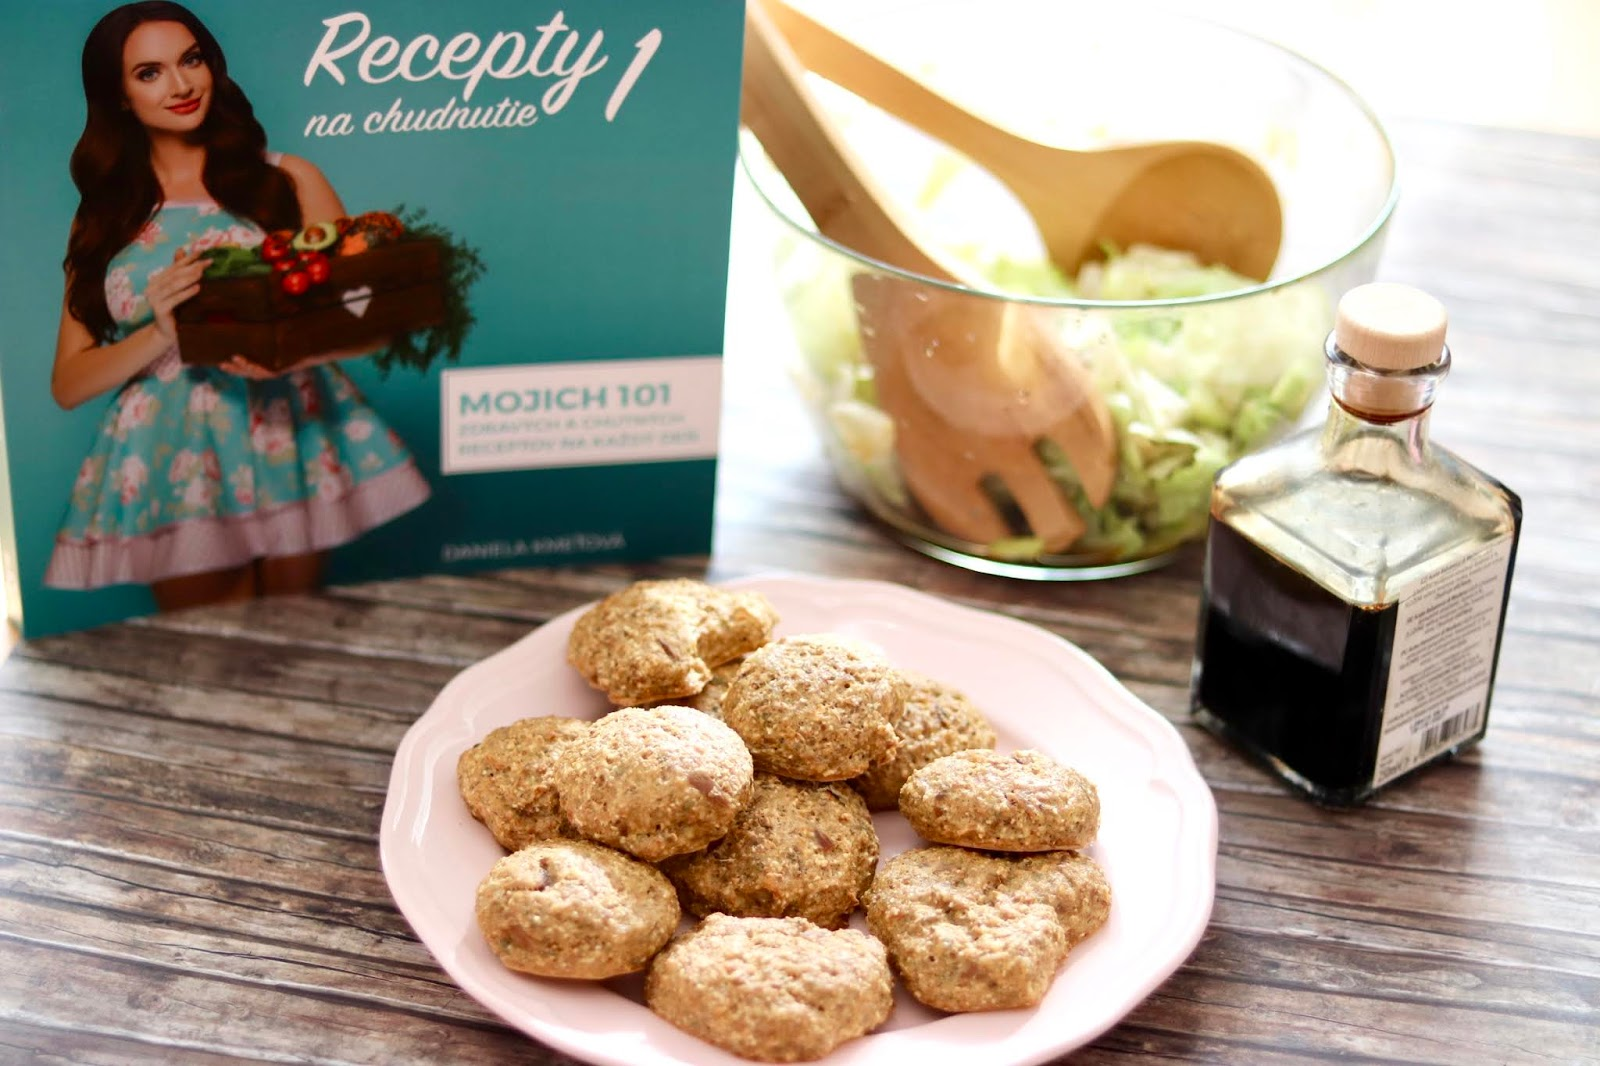 recepty na chudnutie 1